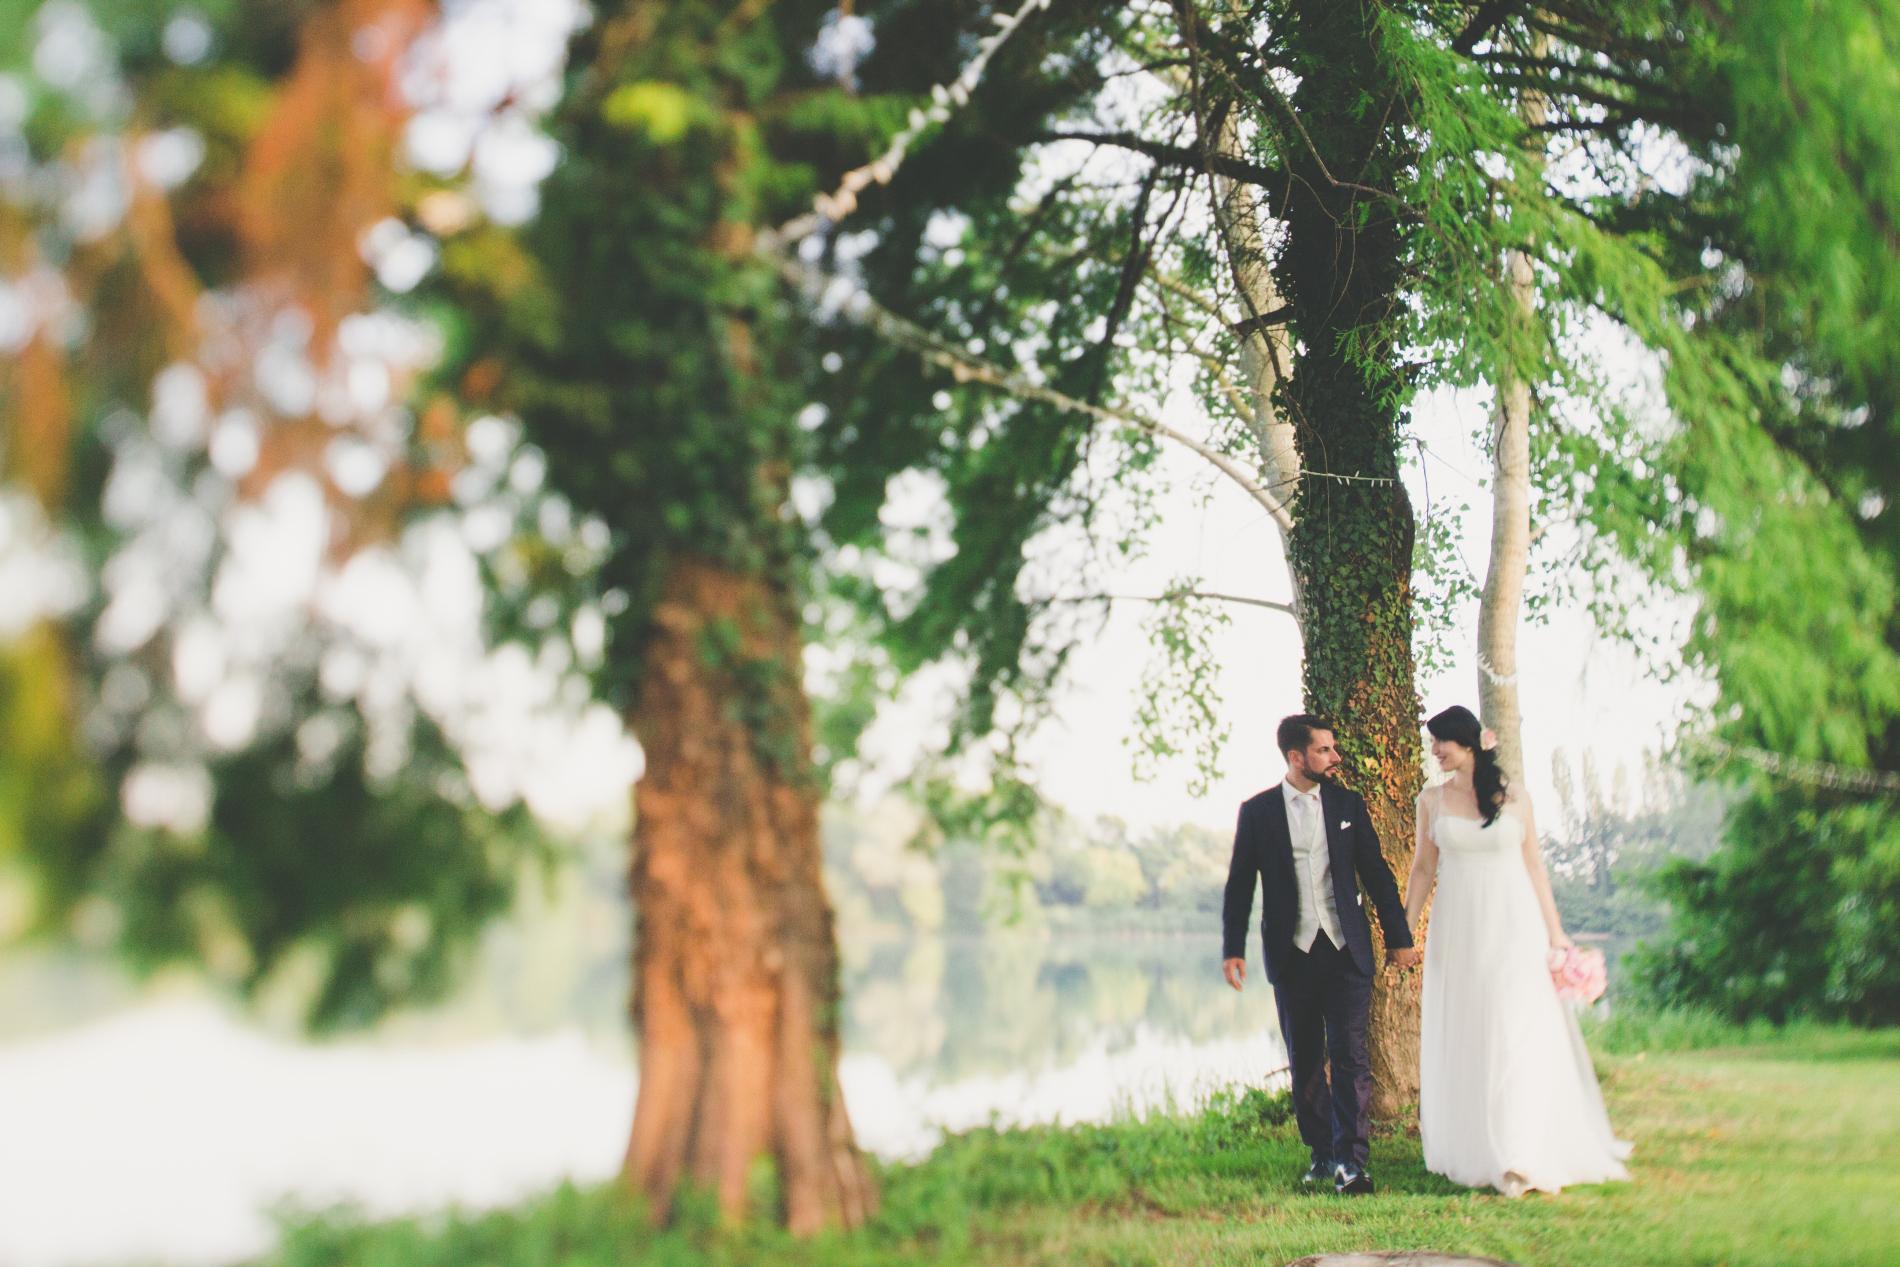 sposi camminano in giardino, sposa vera couture hayez, real weddings, real brides, bride and groom in the garden